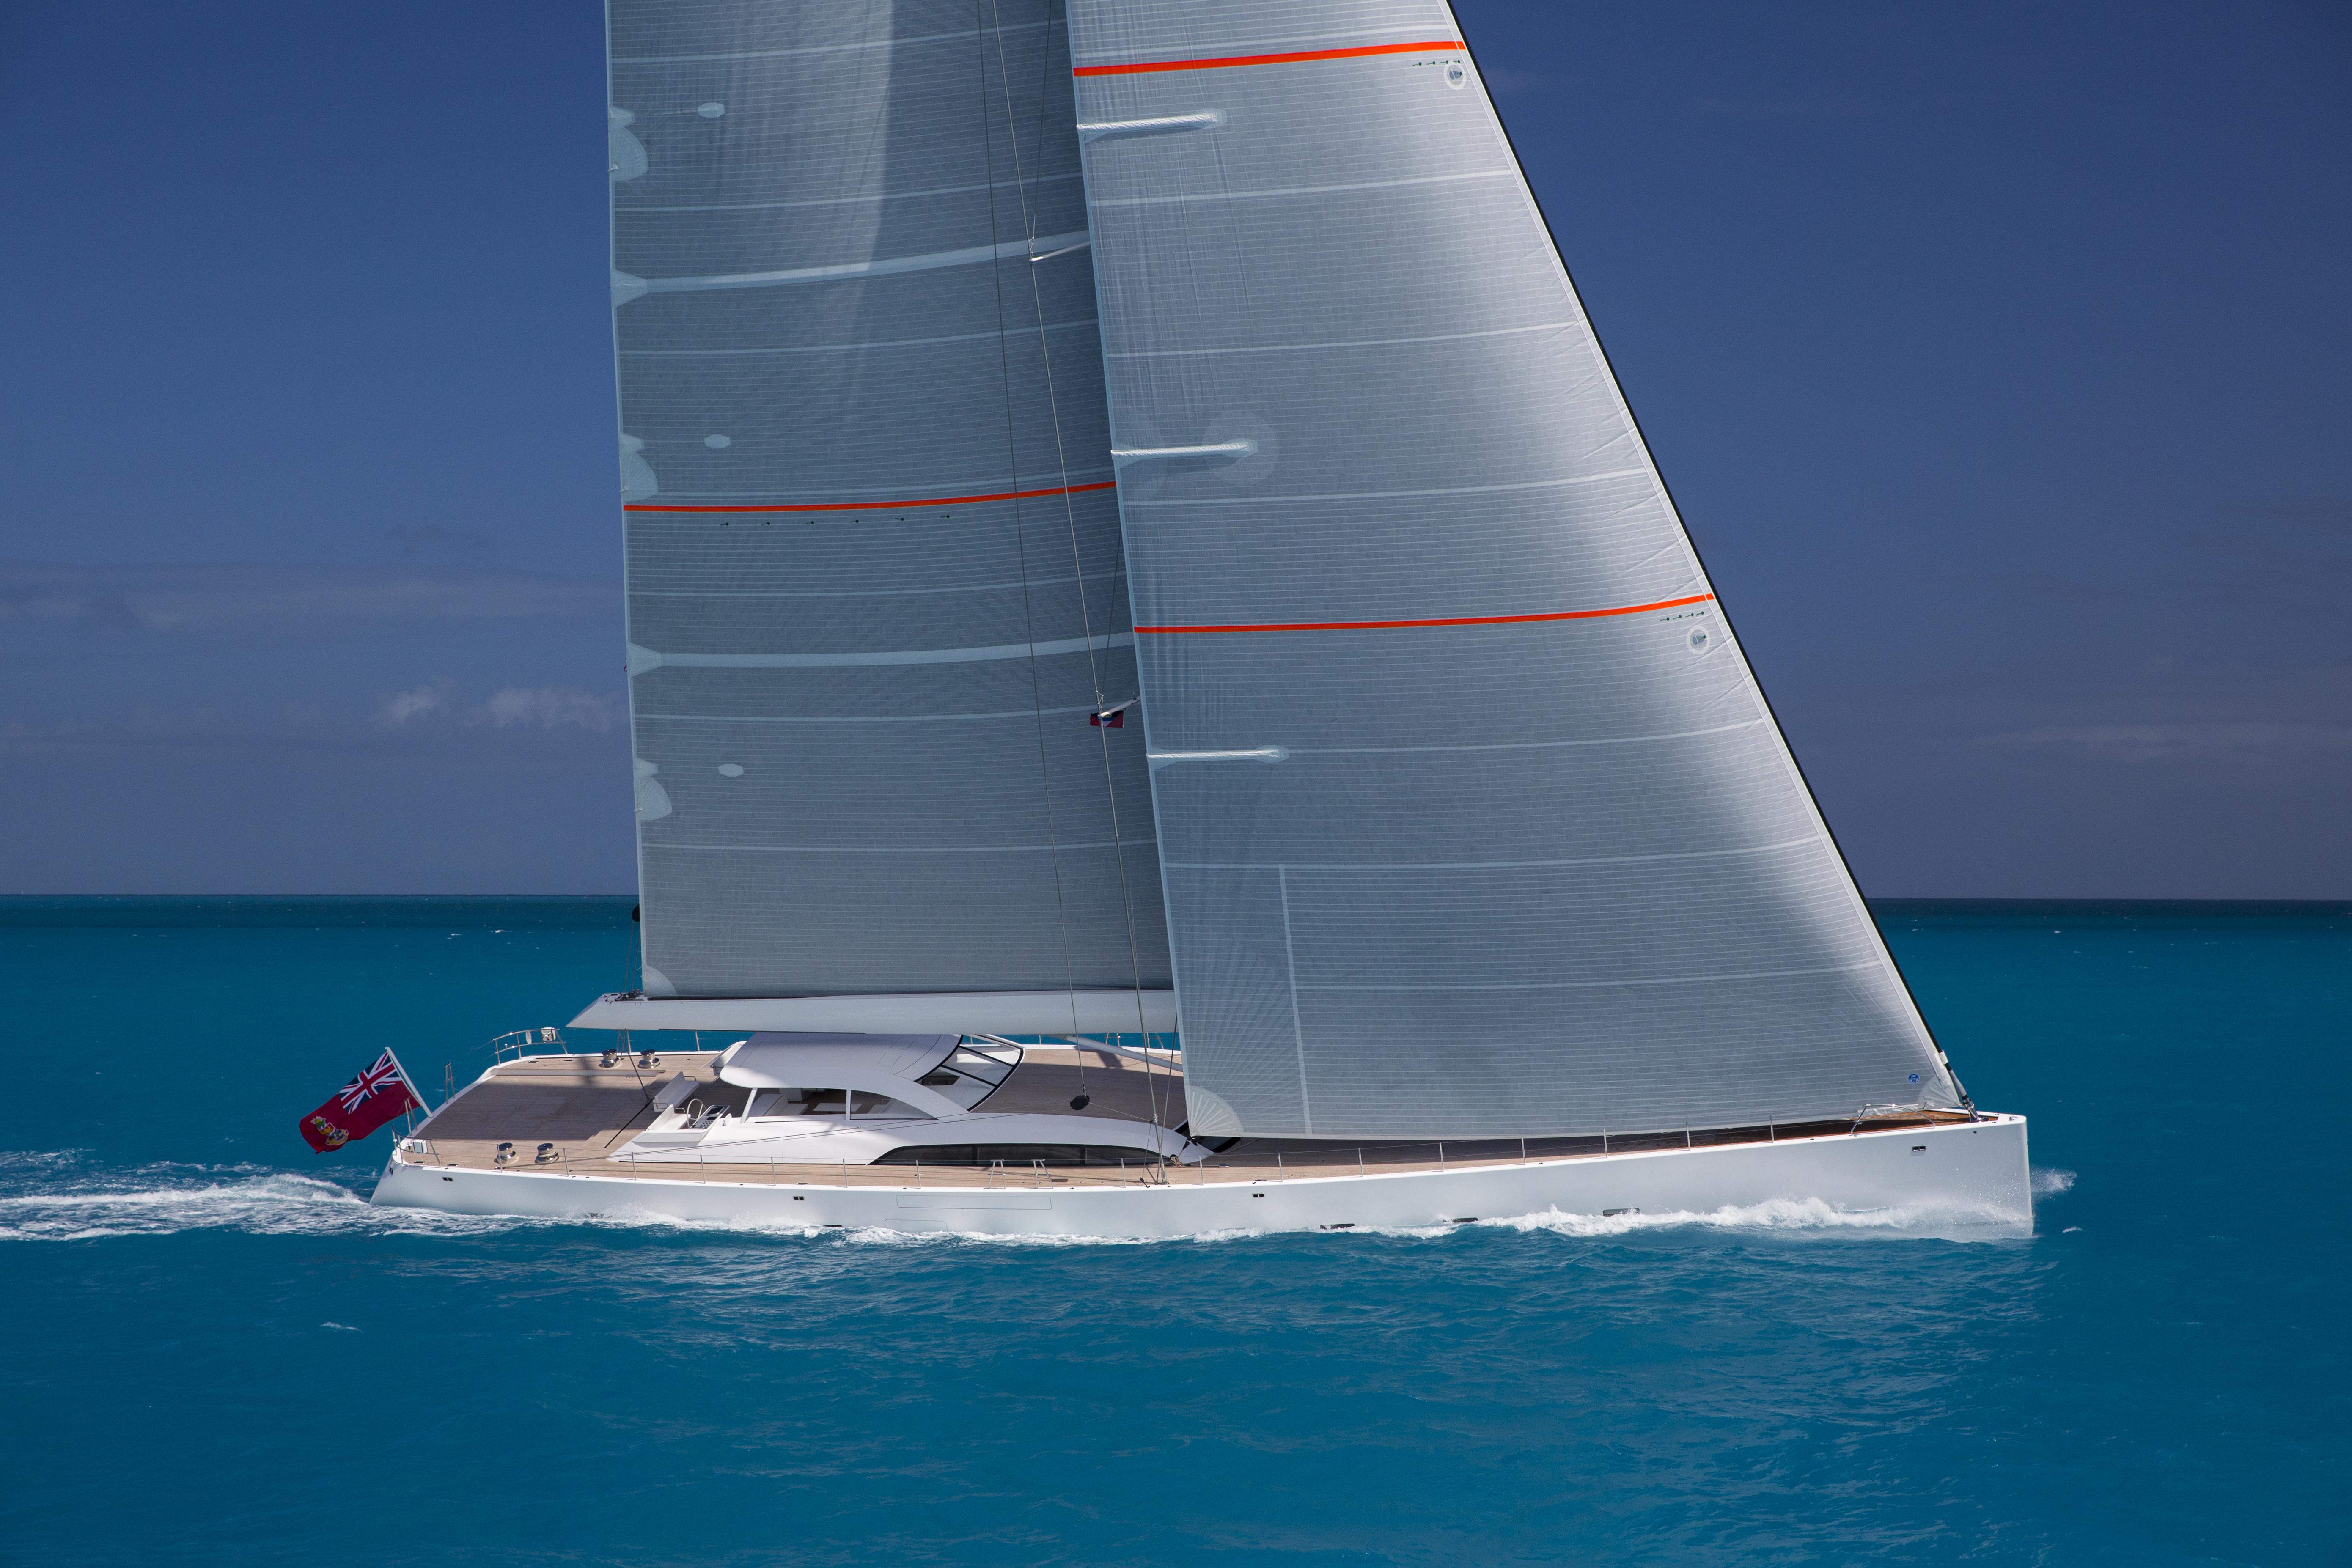 The Unfurled, Sailing Yacht Of The Year photo: Stuart Pearce